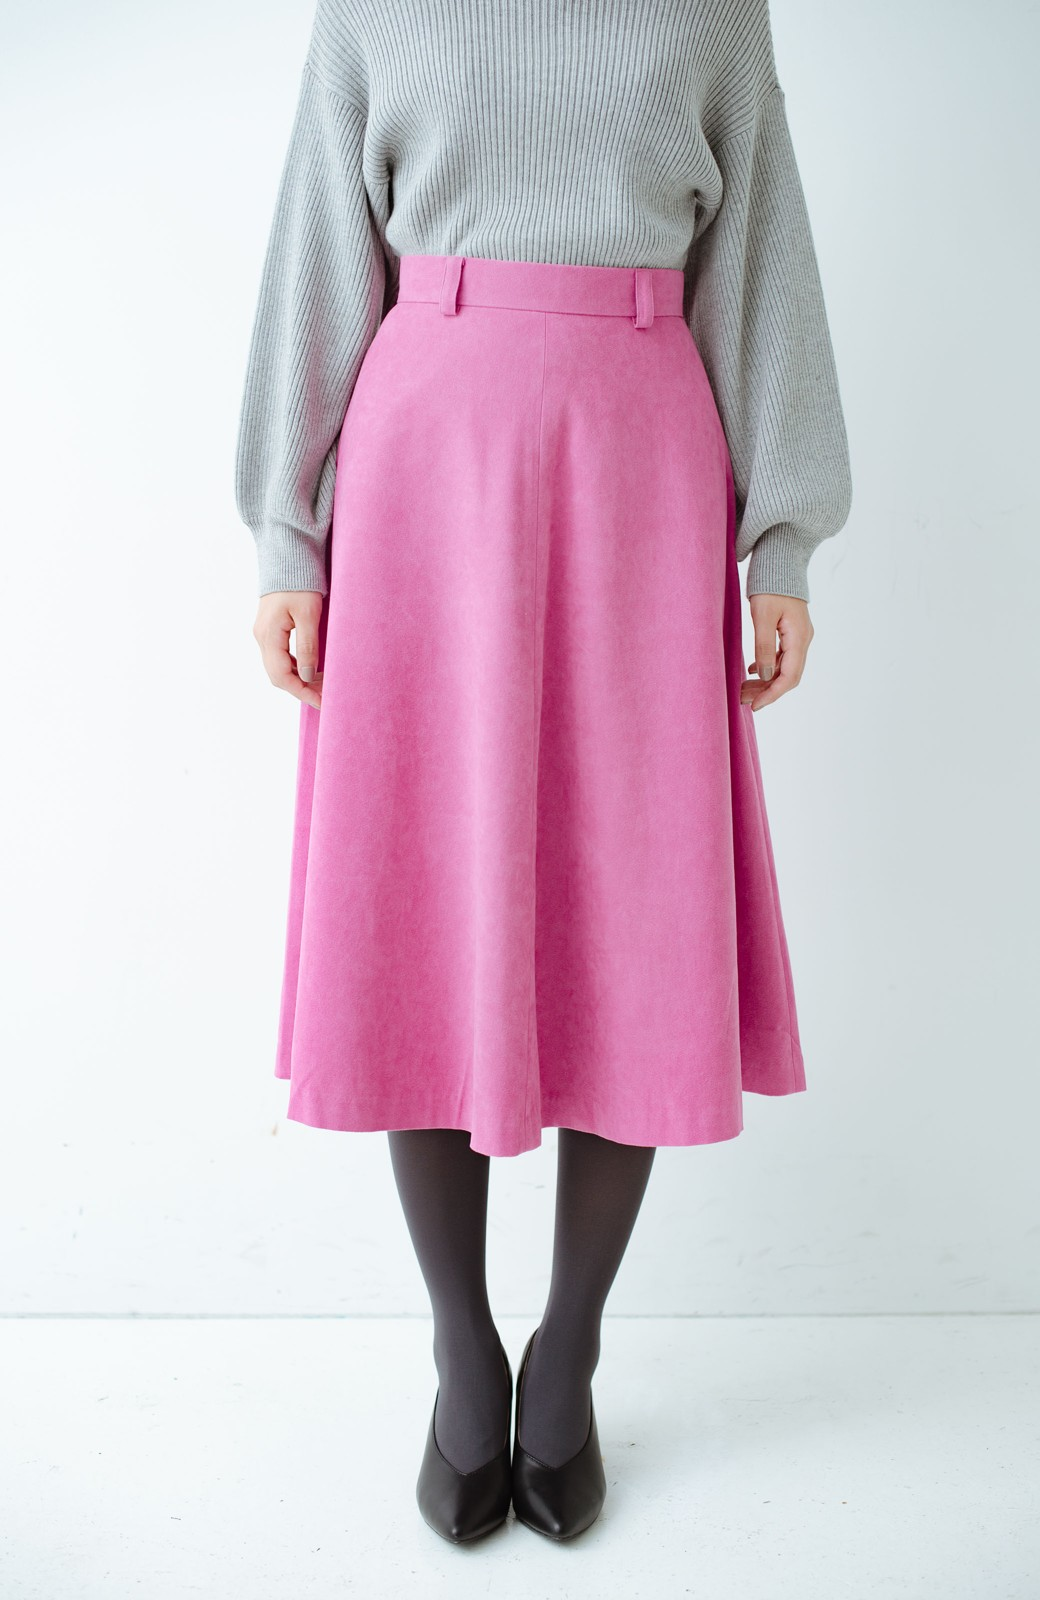 haco! 女っぽく上品に見える フレアースカート by que made me <ピンク>の商品写真1